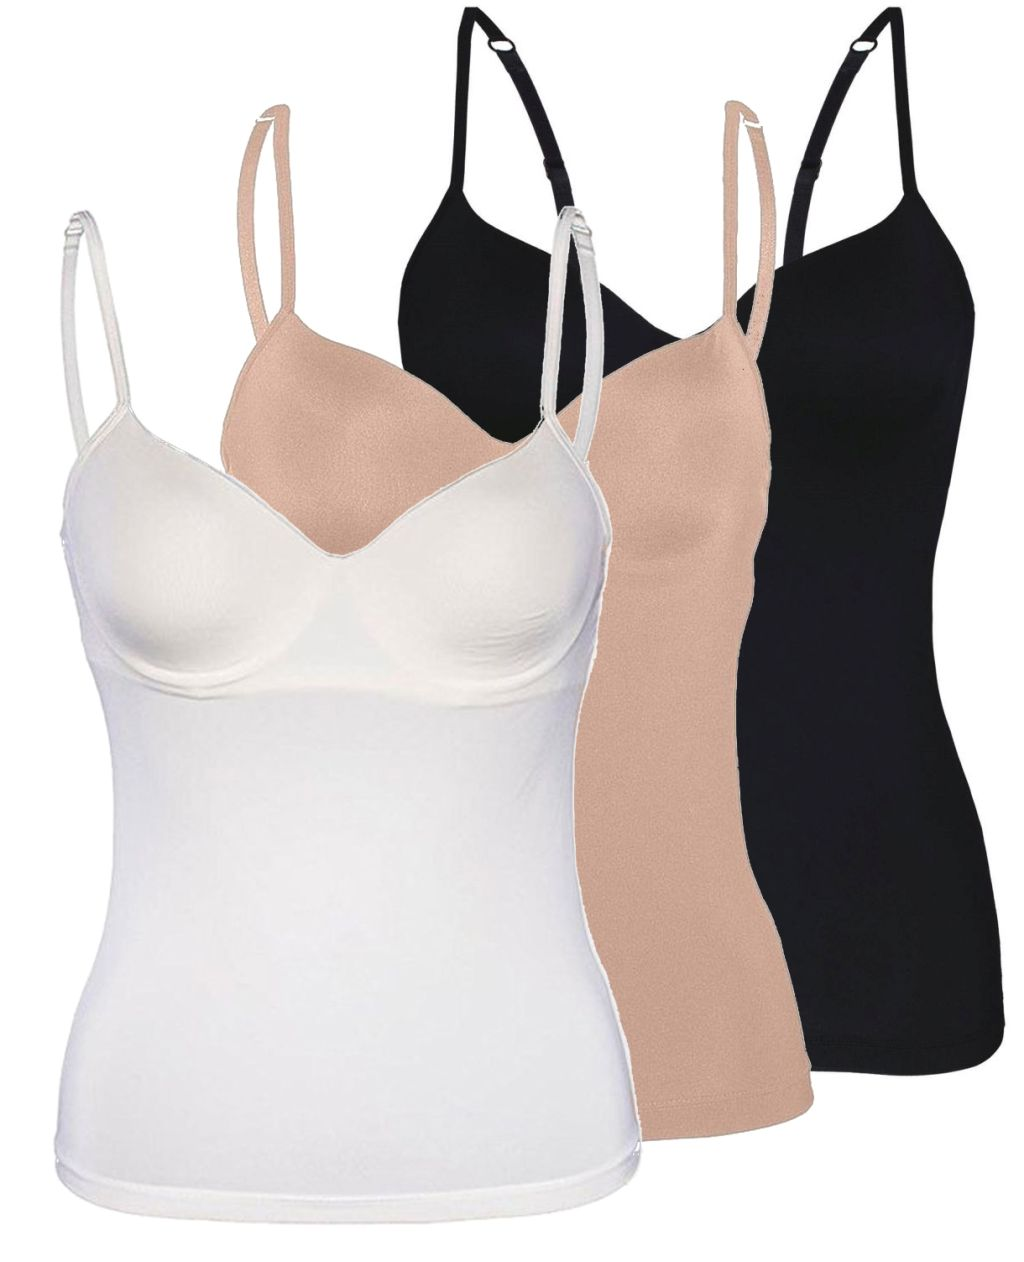 Sassa Damen BH Hemd Unterhemd Shirt Top 70-95  A B C D Elfenbein Schwarz Haut